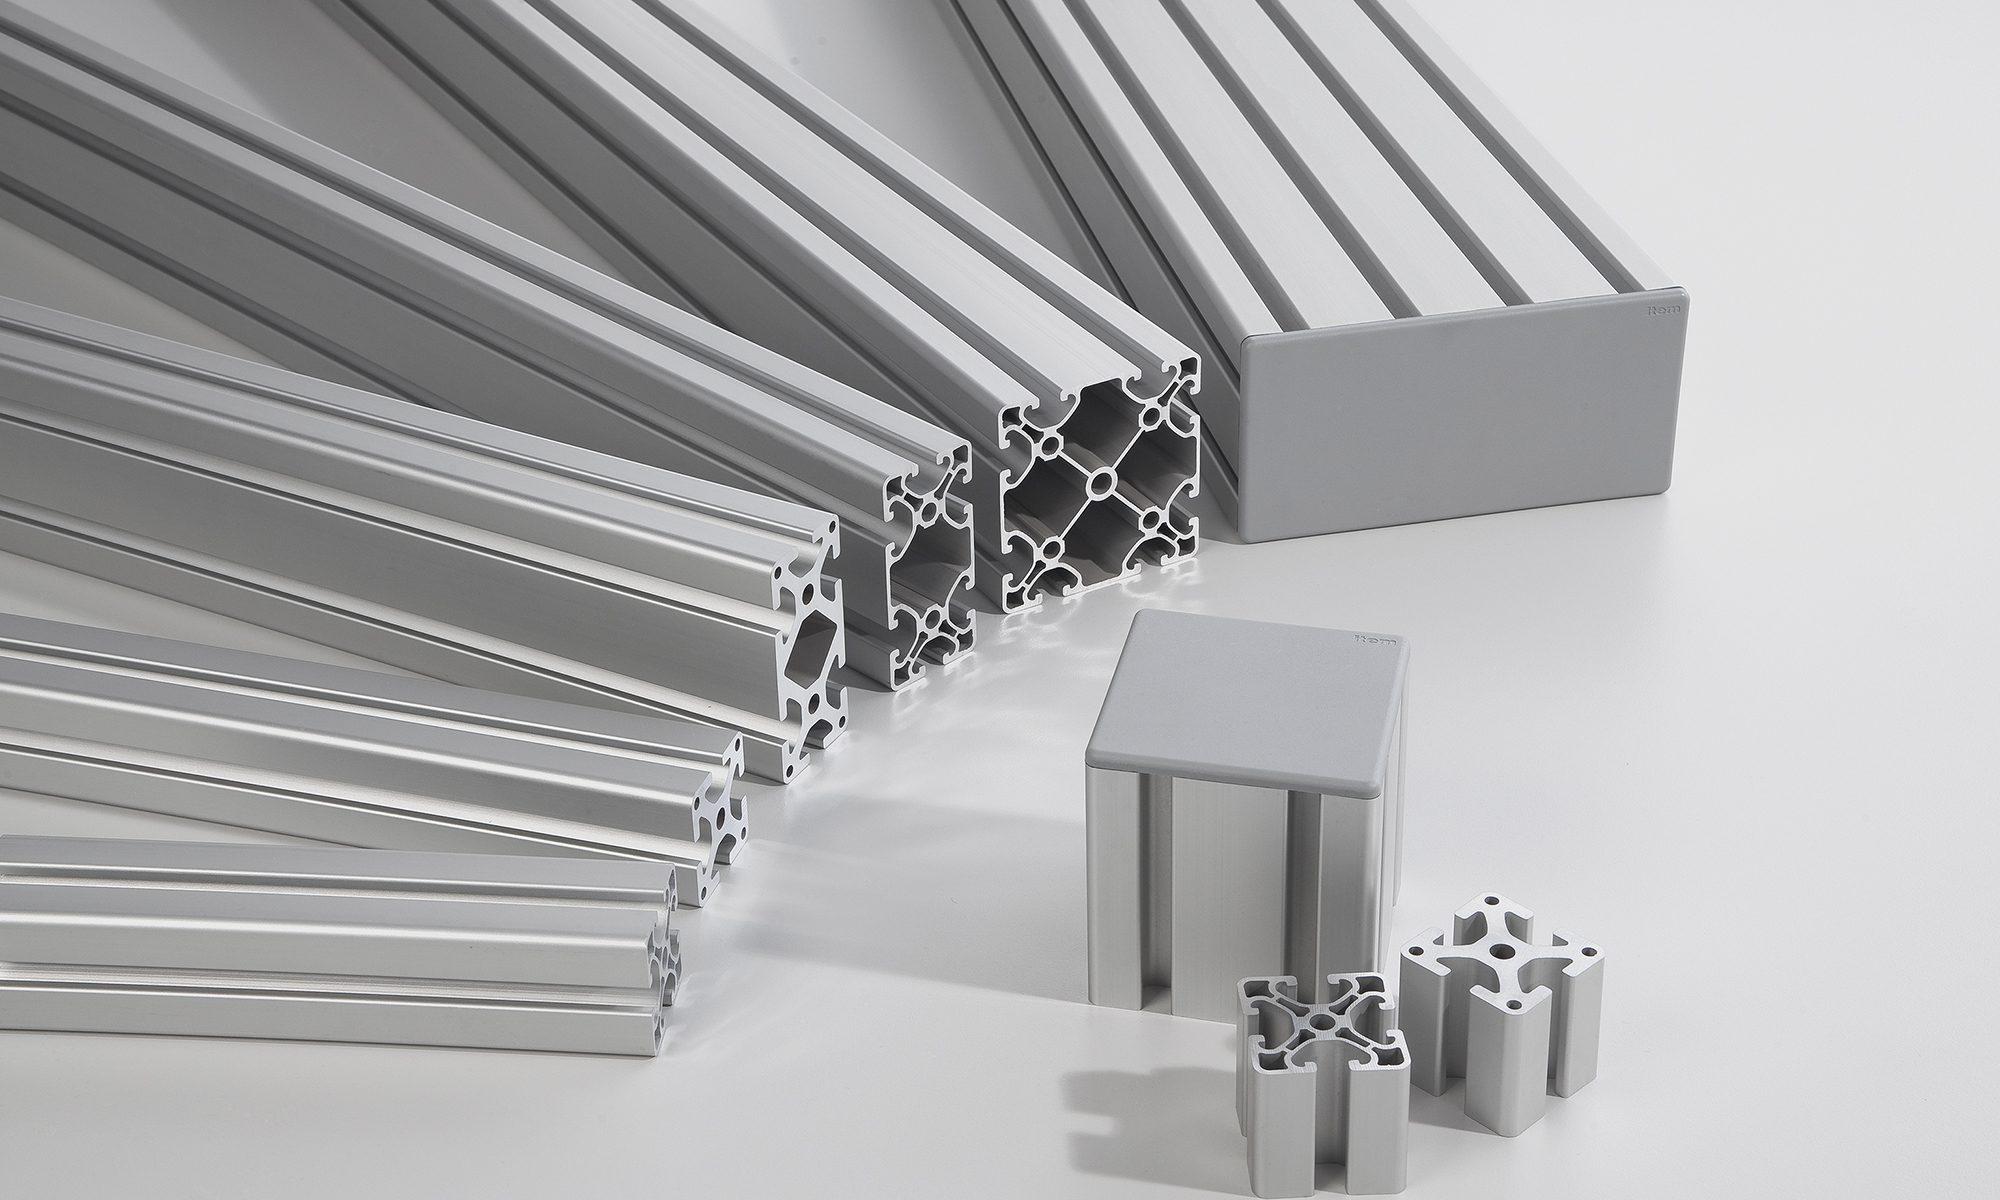 Aluminium profiles in specialist mechanical engineering – ideas and